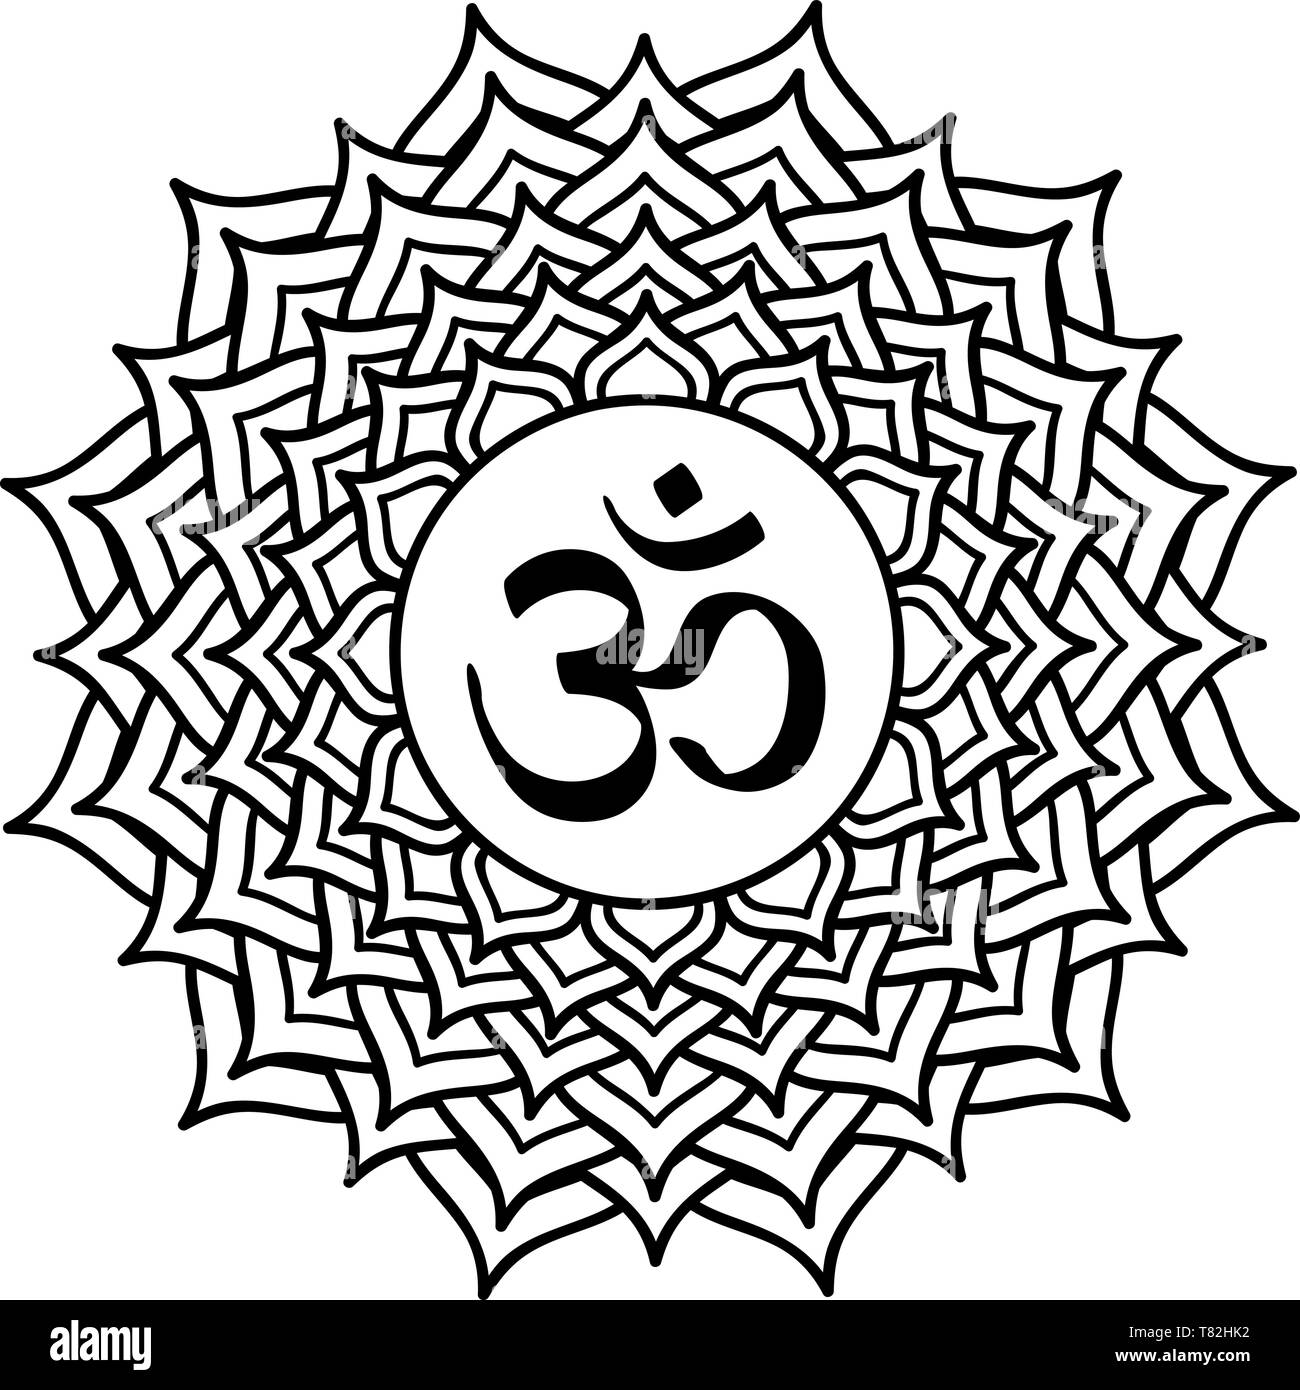 sahasrara chakra om crown thousandfold crest white transparent - Stock Image